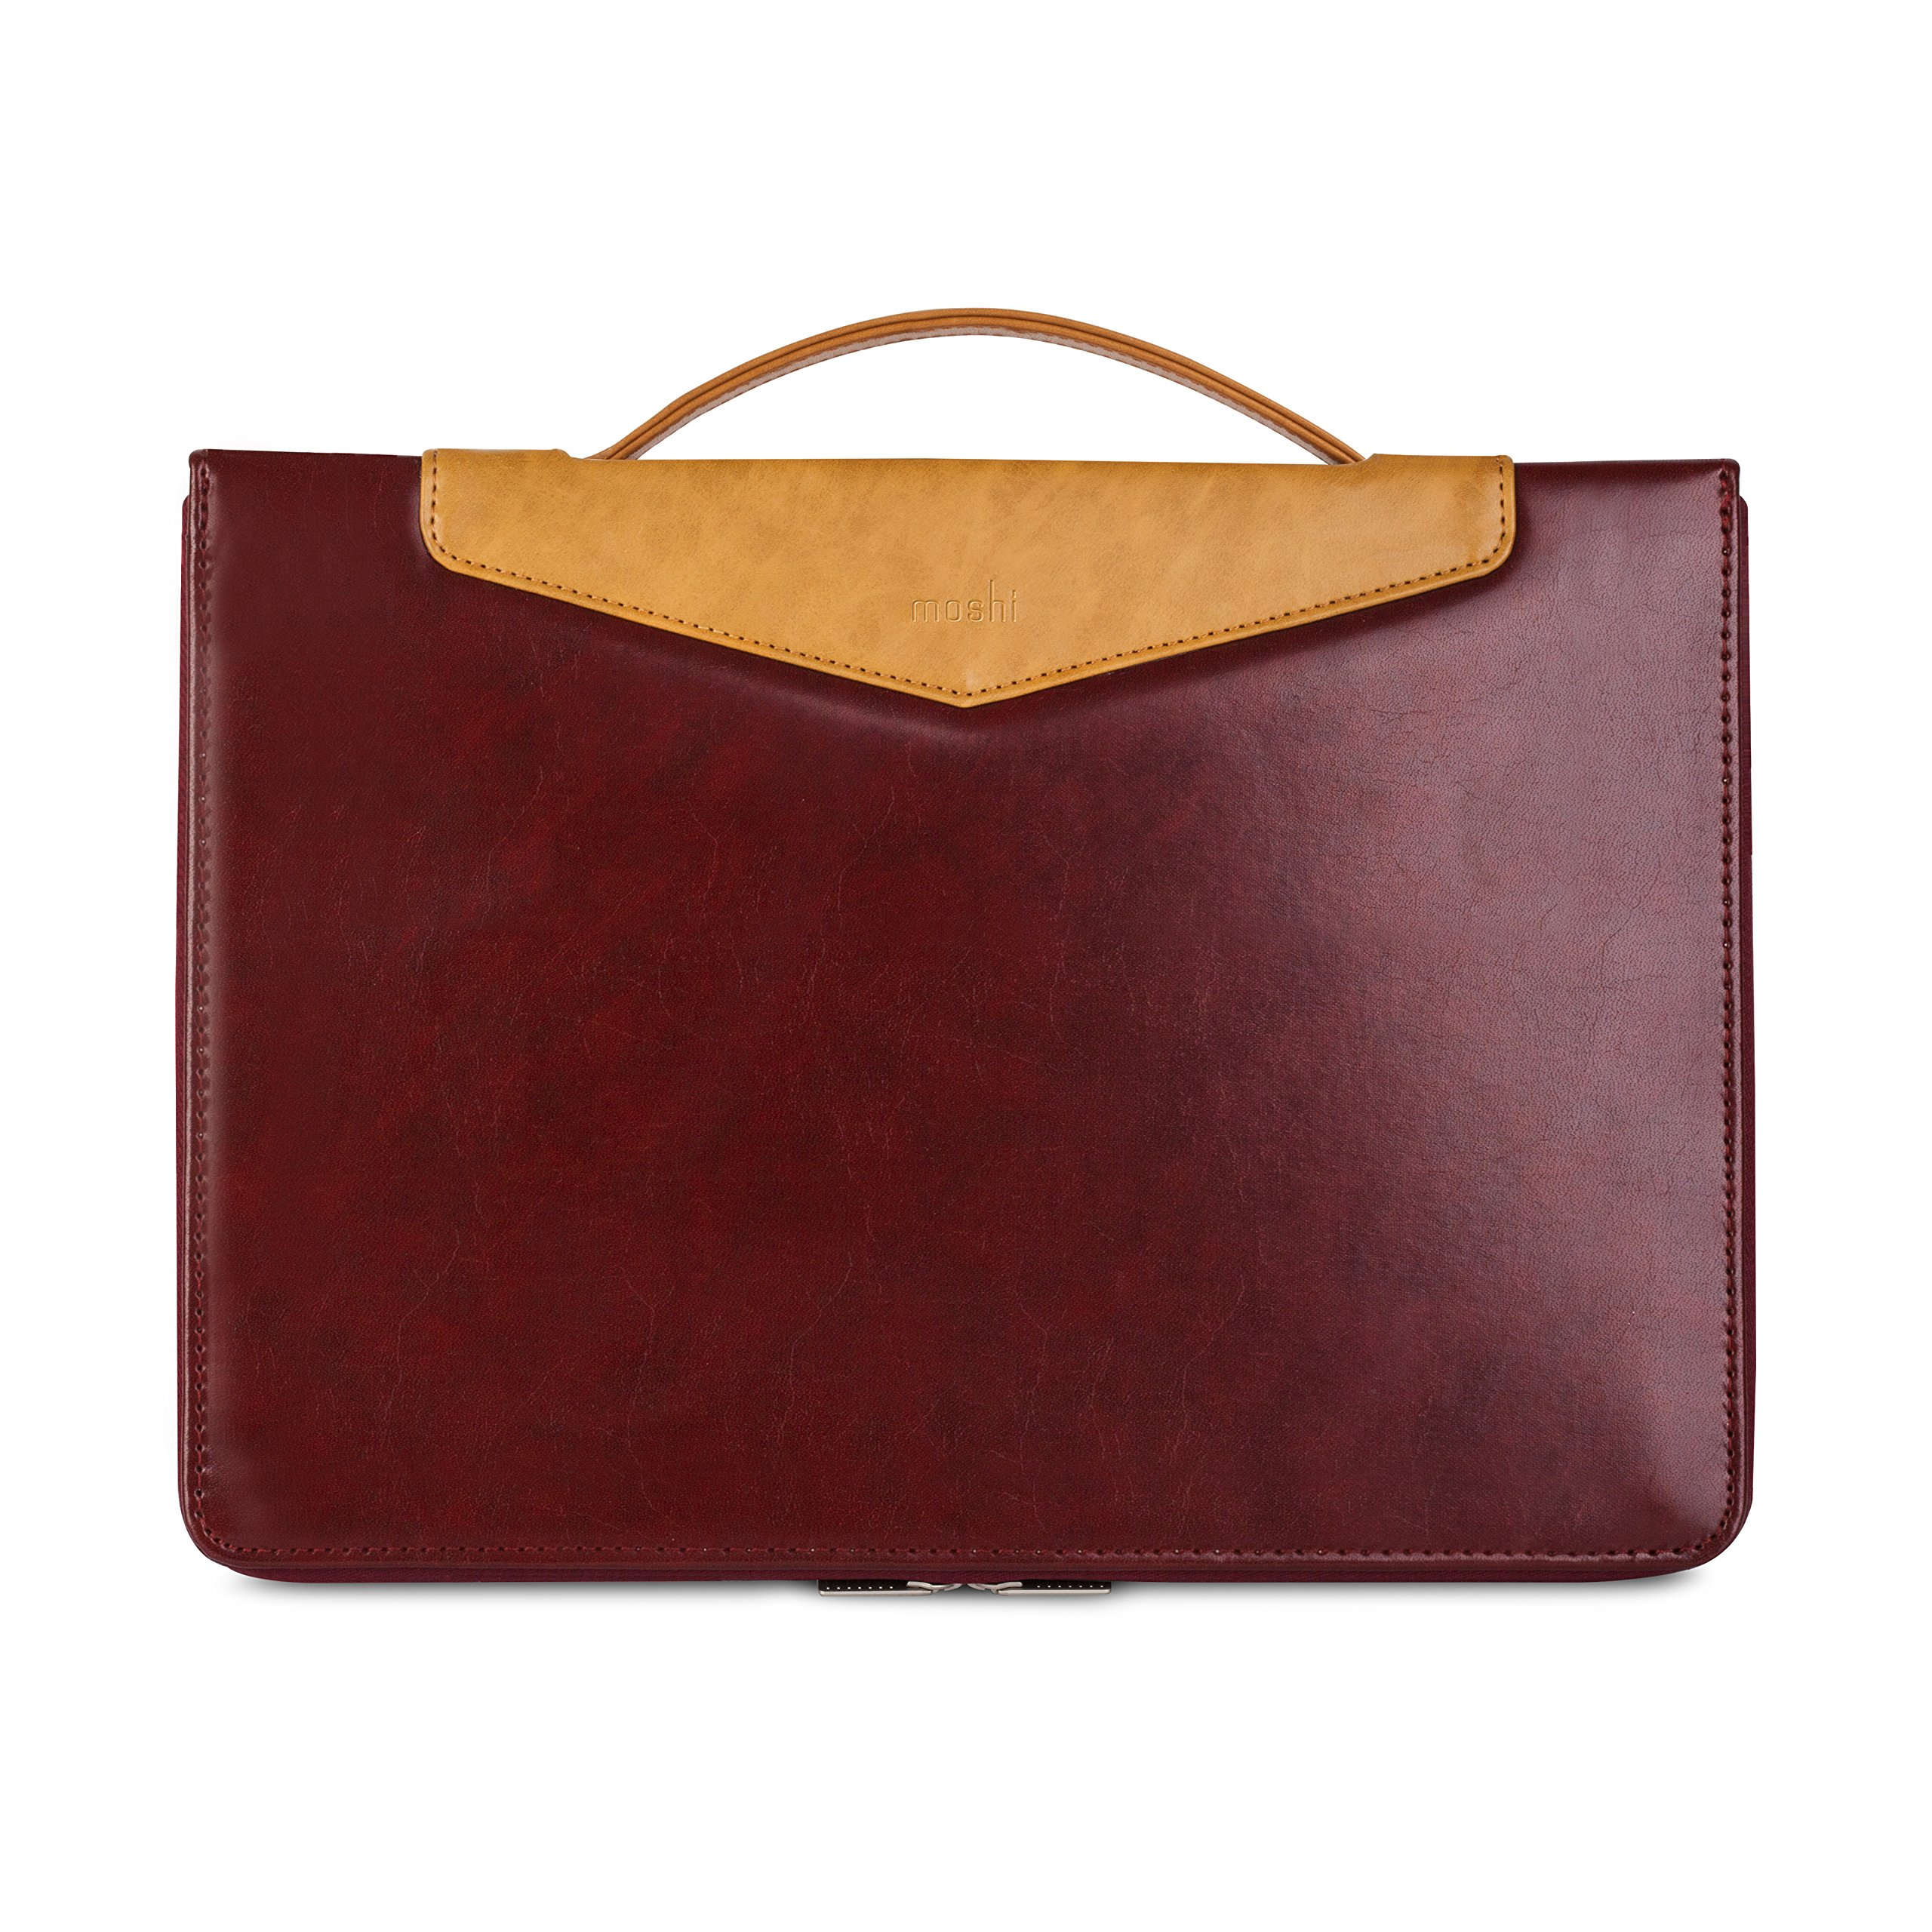 Moshi Codex Laptop Case for MacBook 15'' 2016 Models - Burgundy Red